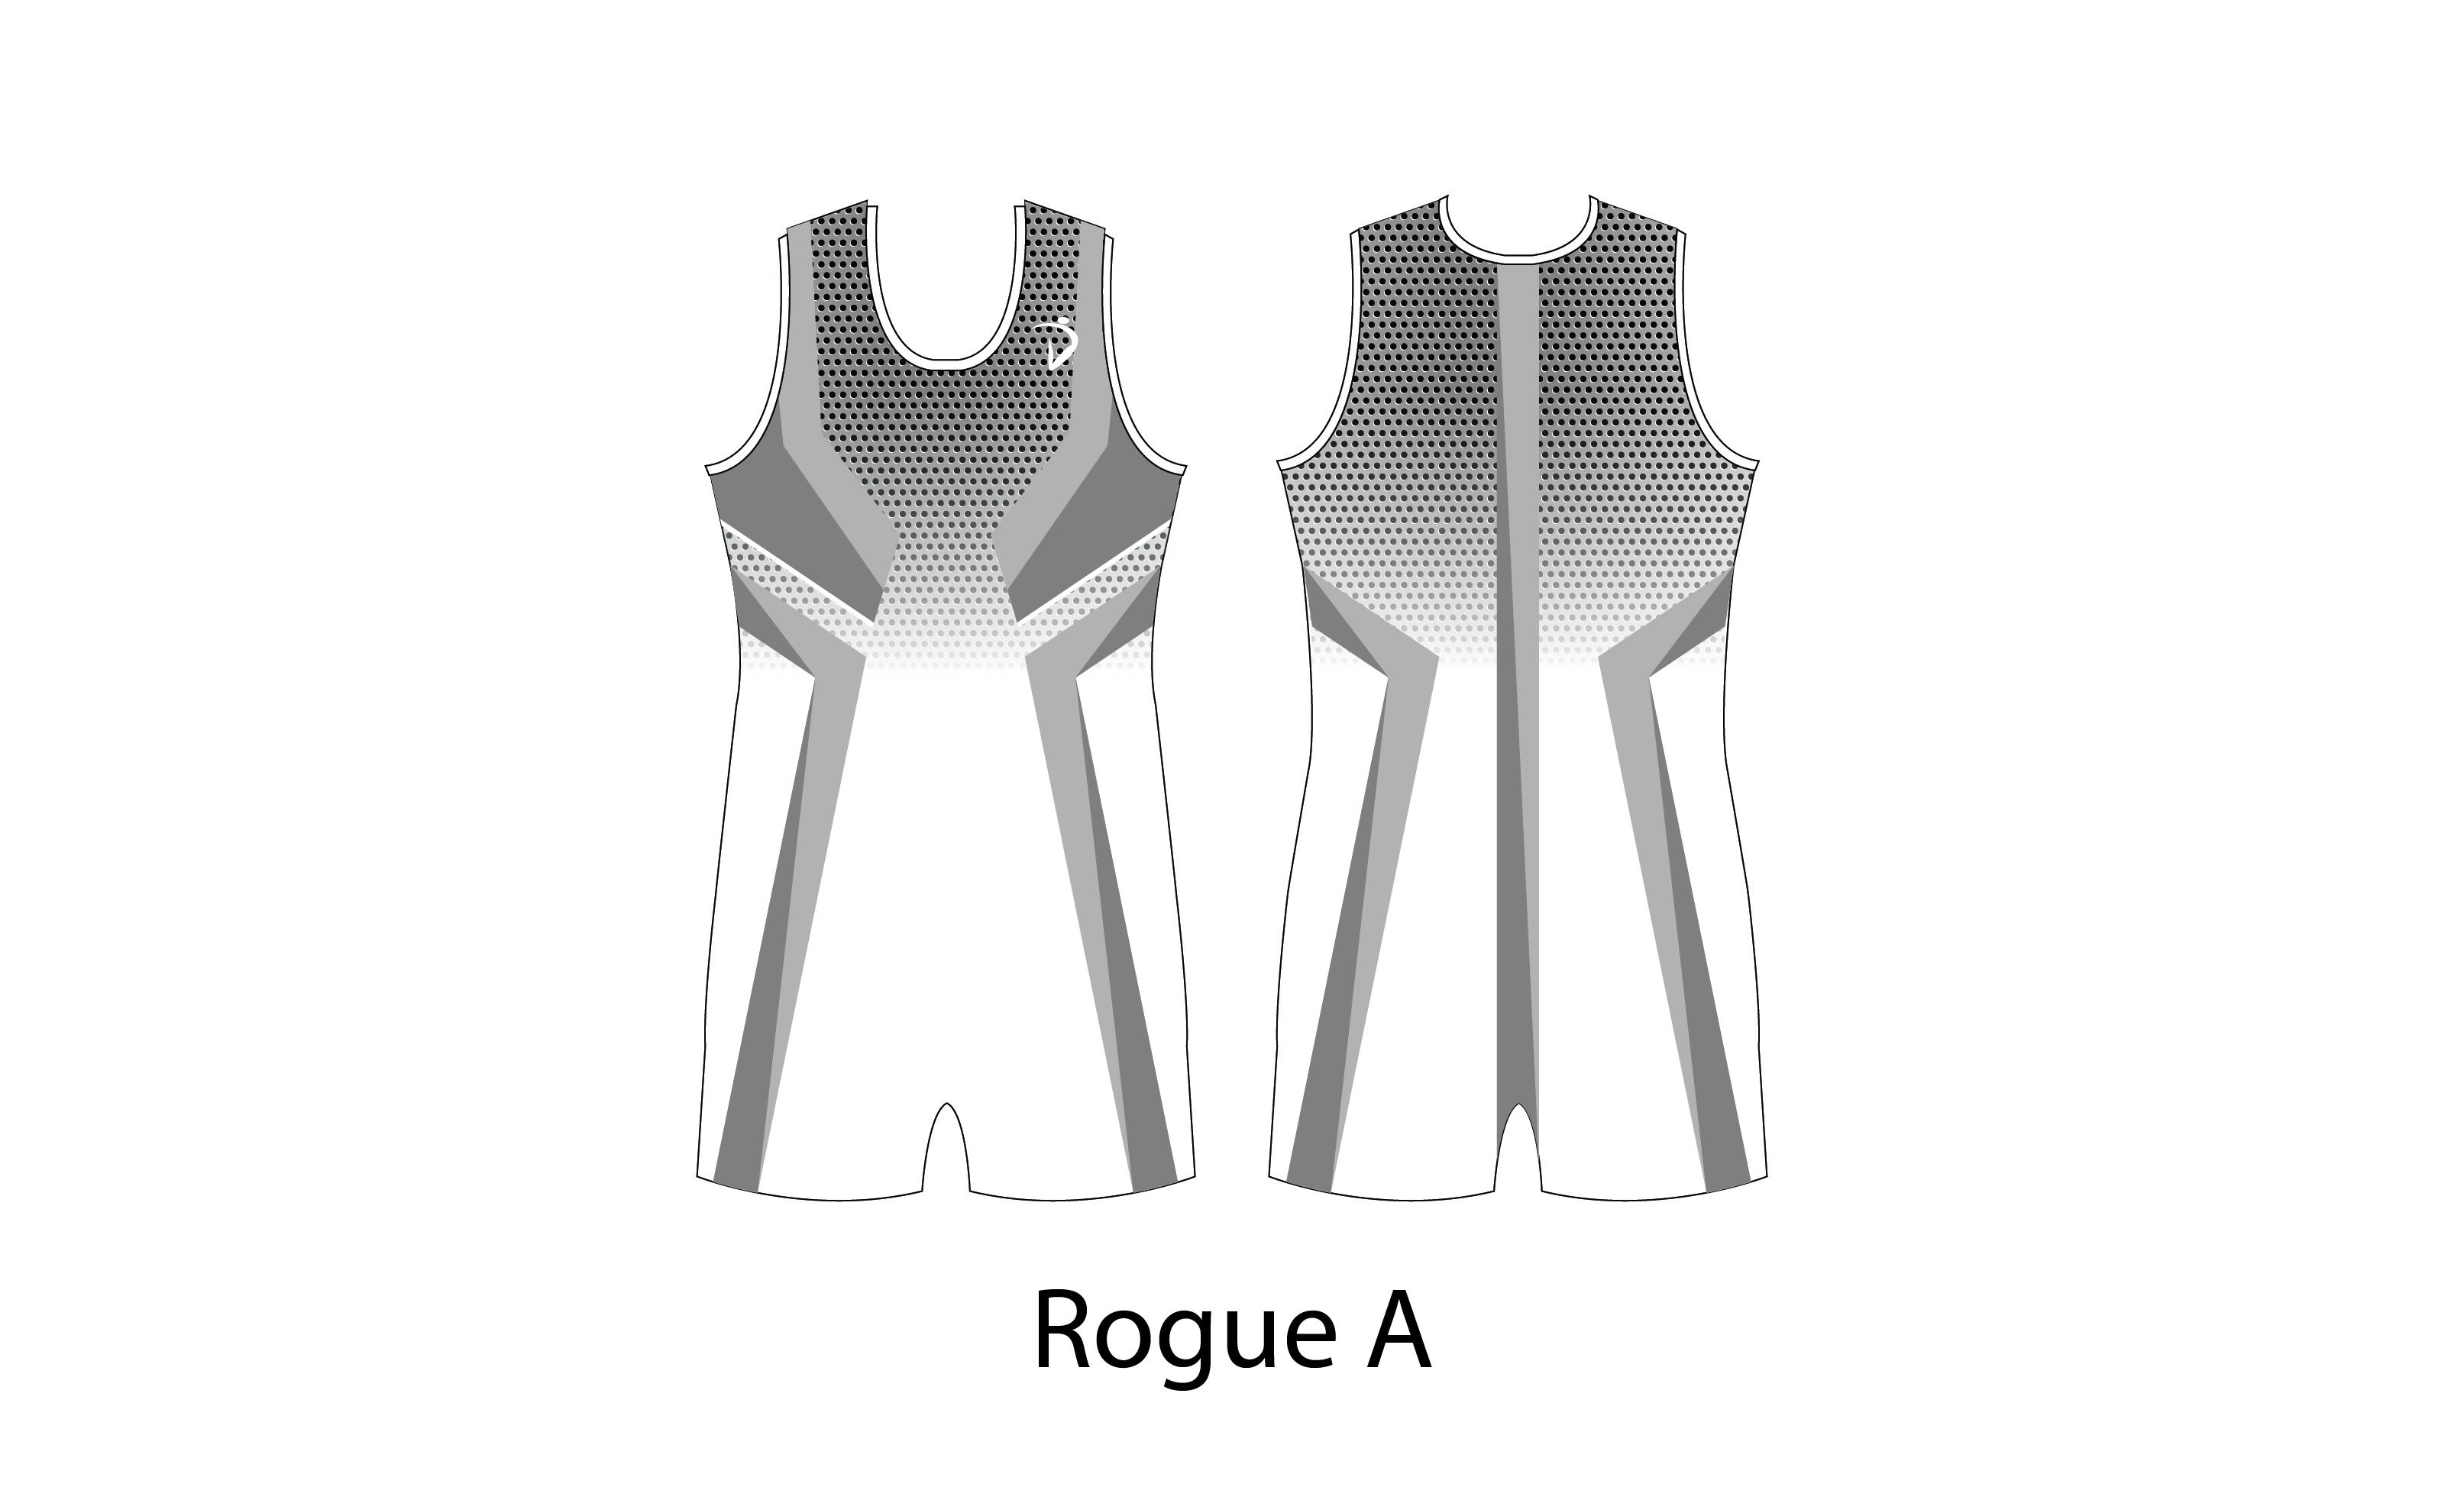 Rogue A